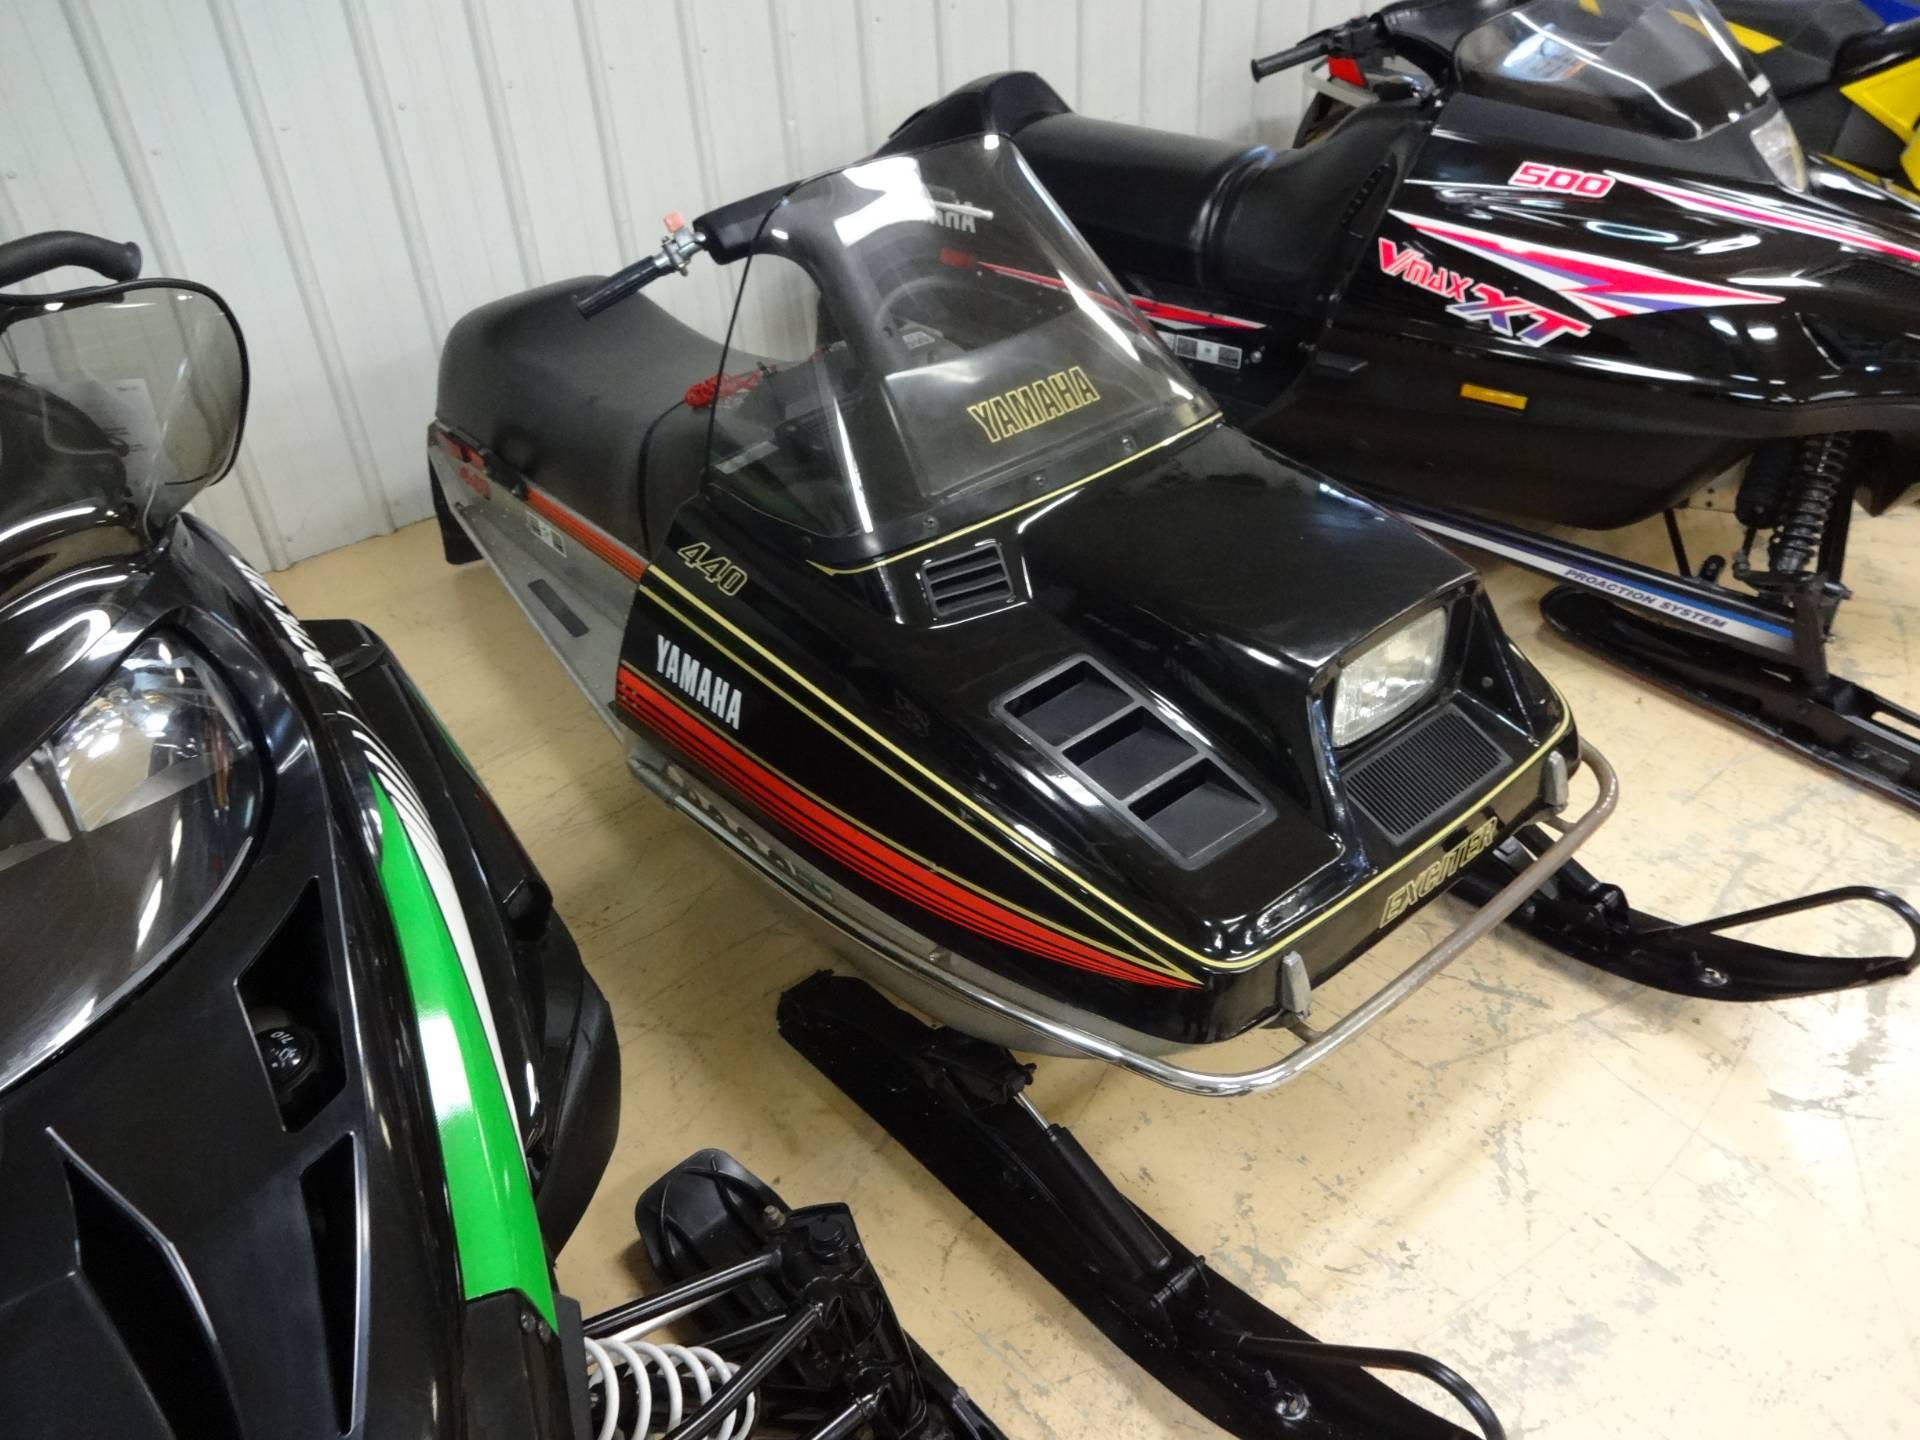 Yamaha 440 engine bing images for Yamaha 440 snowmobile engine